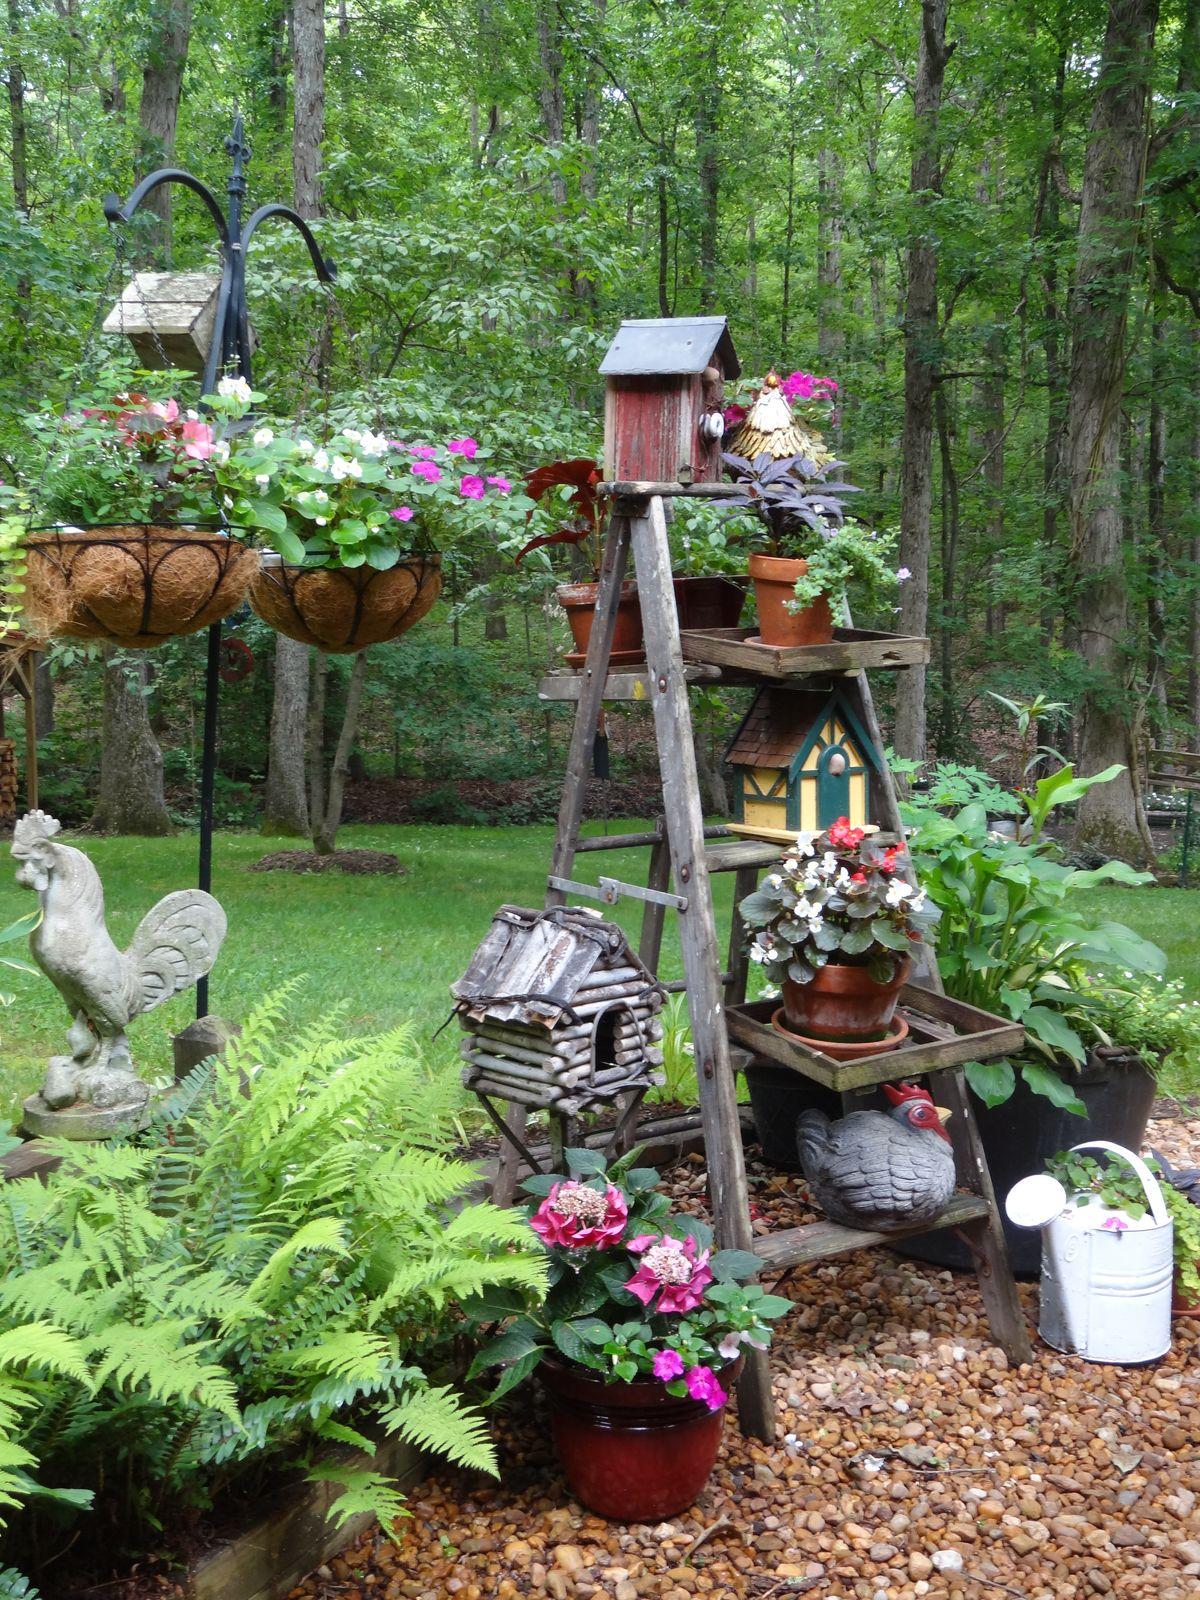 garden-ornament-1 100+ Surprising Garden Design Ideas You Should Not Miss in 2021